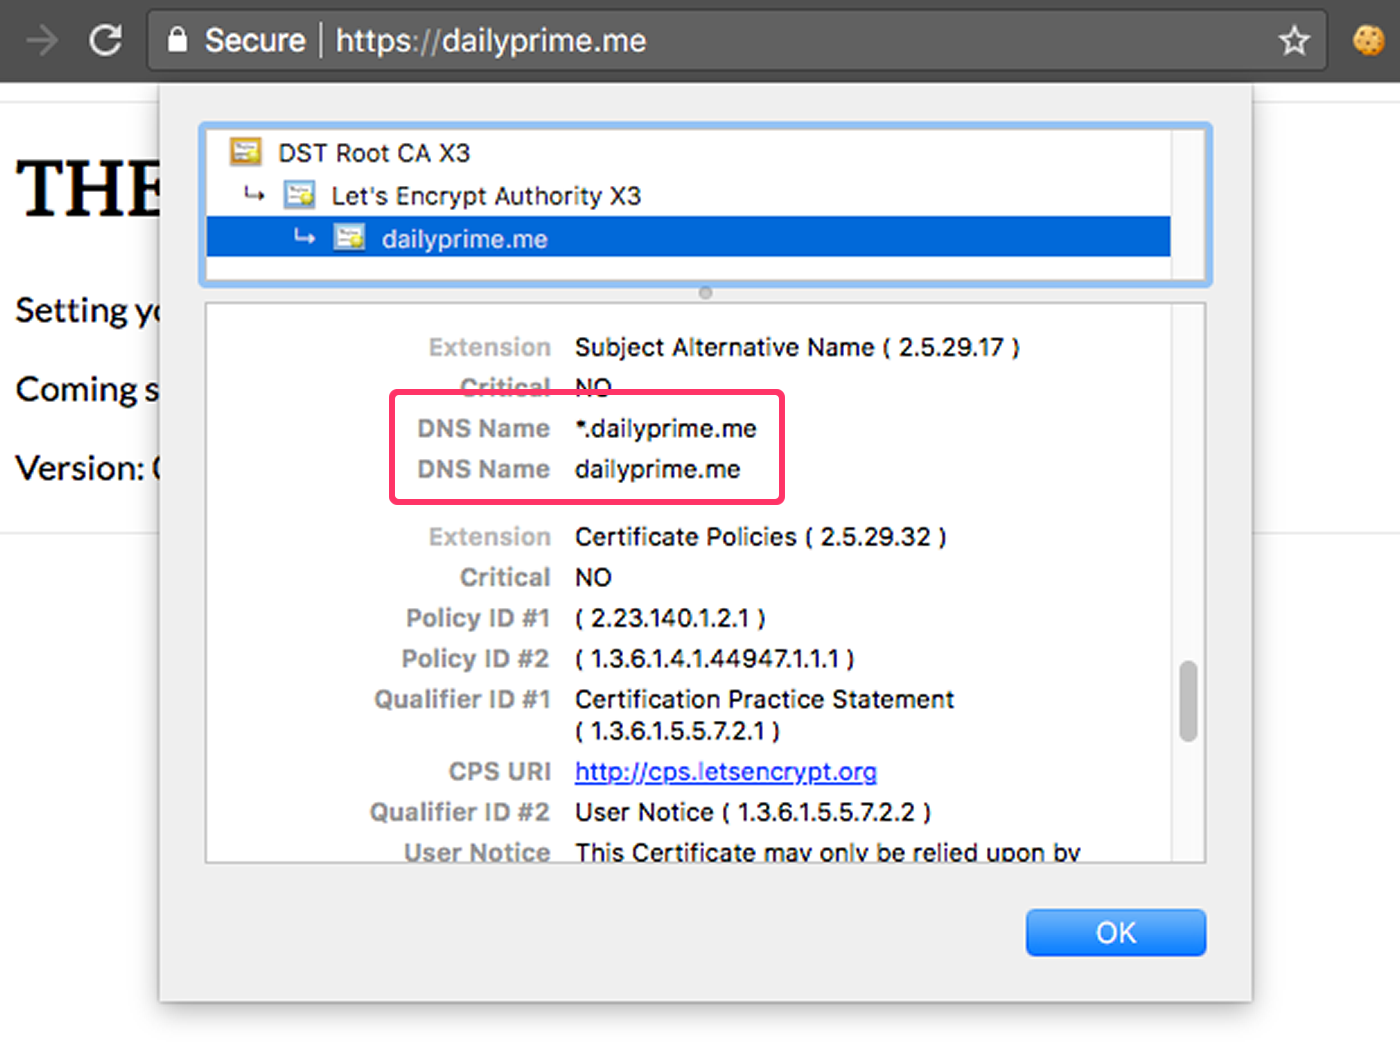 LetsEncrypt wildcard SSL certificate issued.